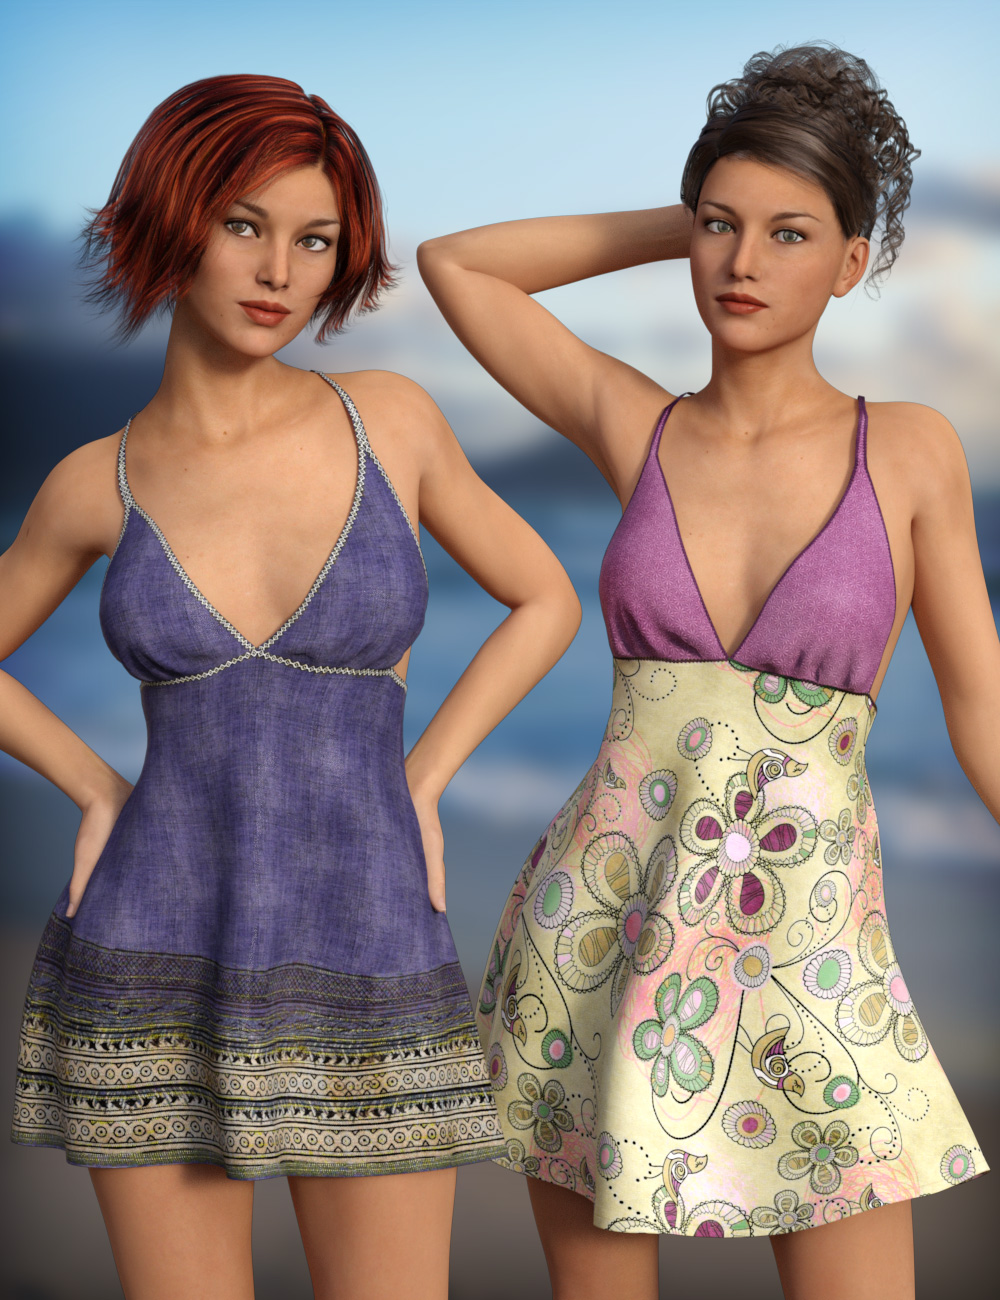 Sun Dress Textures by: esha, 3D Models by Daz 3D